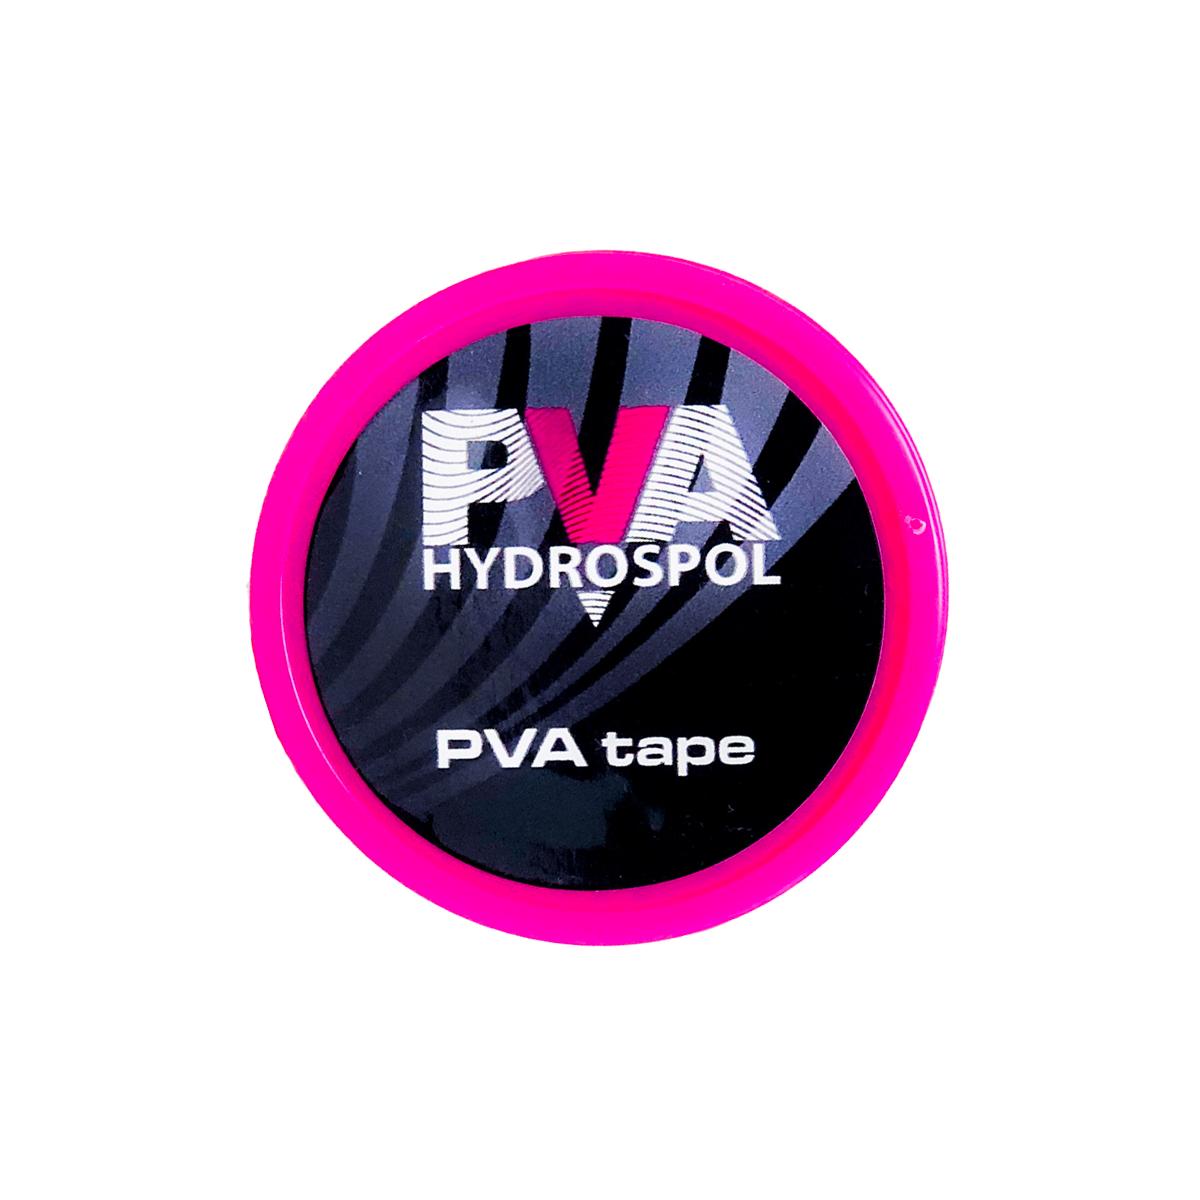 PVA HYDROSPOL  pva tape extra strong 20 meter